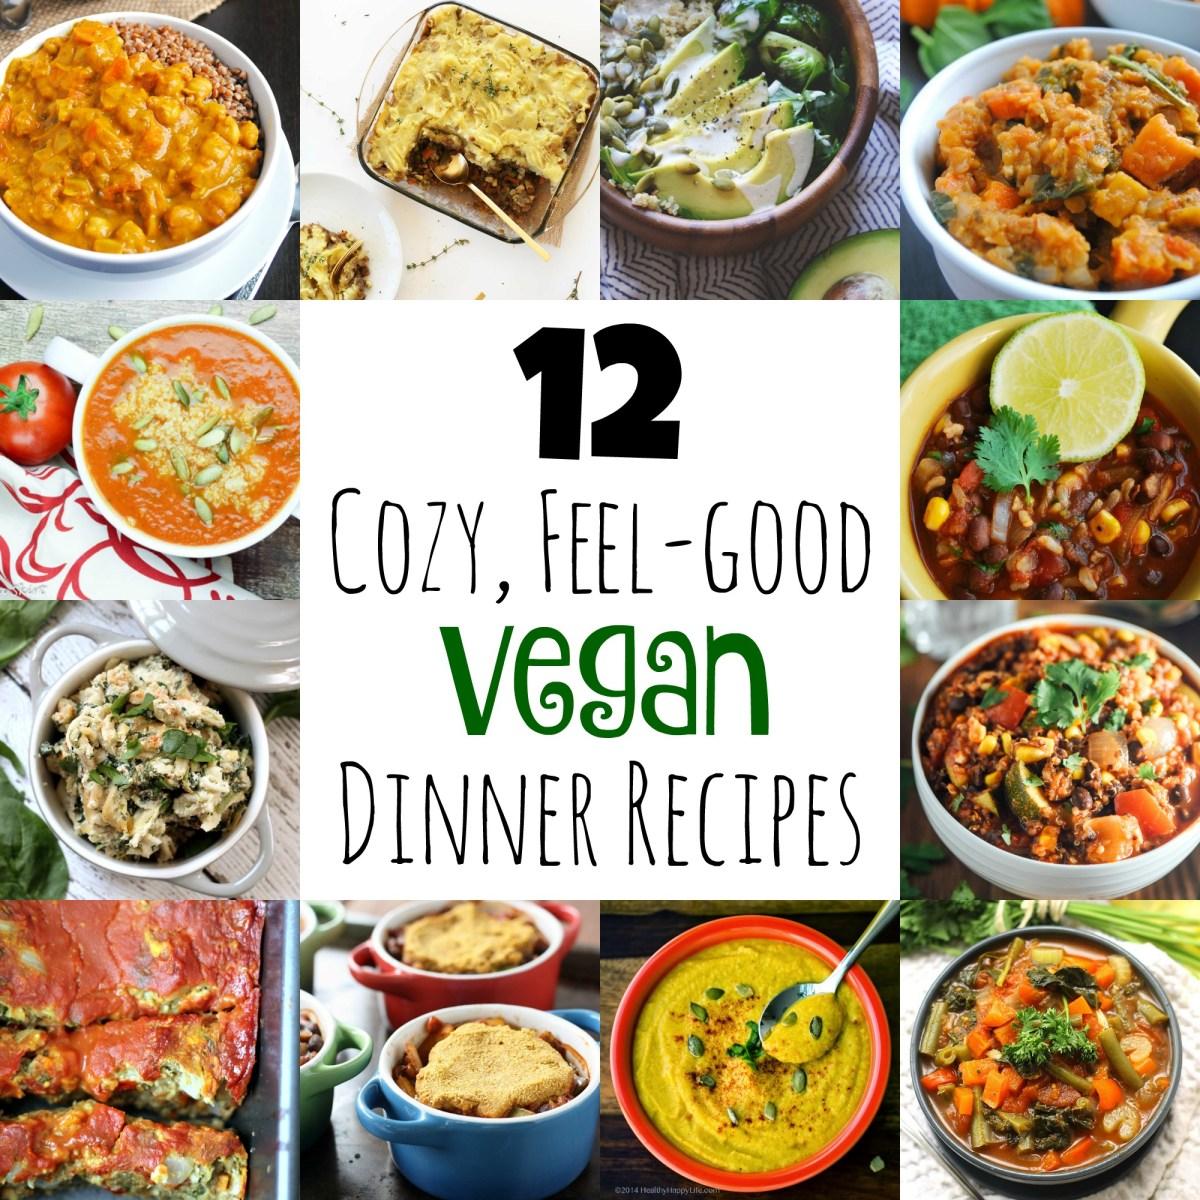 12 Cozy, Feel-Good Vegan Dinner Recipes